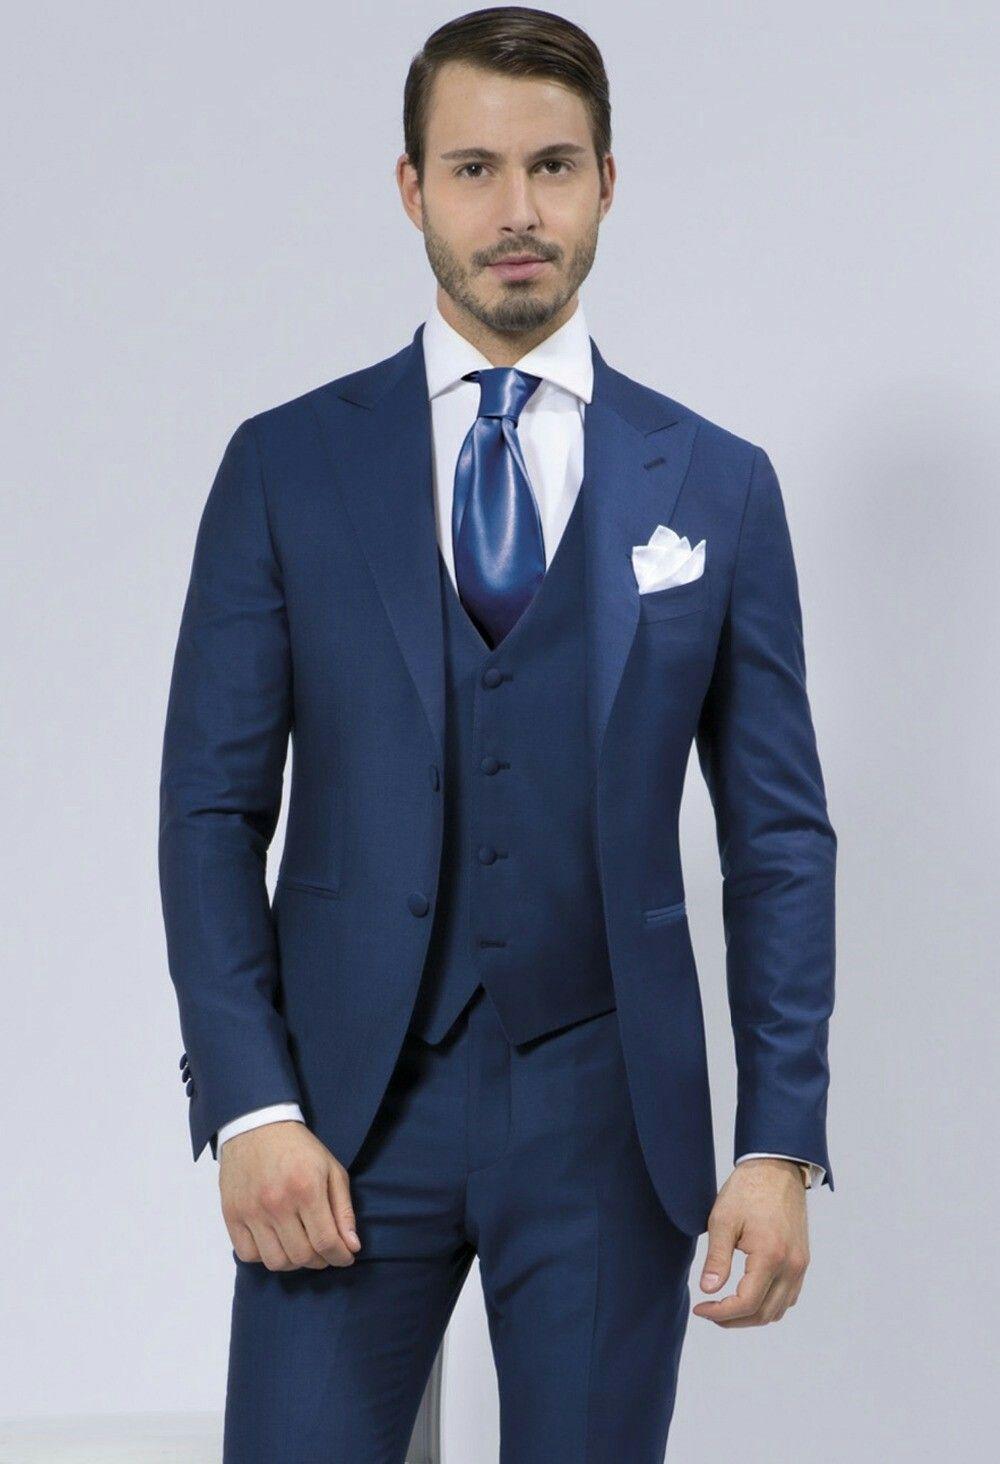 Navy Blue Groomsman\'s Best Man Wedding Suit Idea\'s For Men | Suits ...